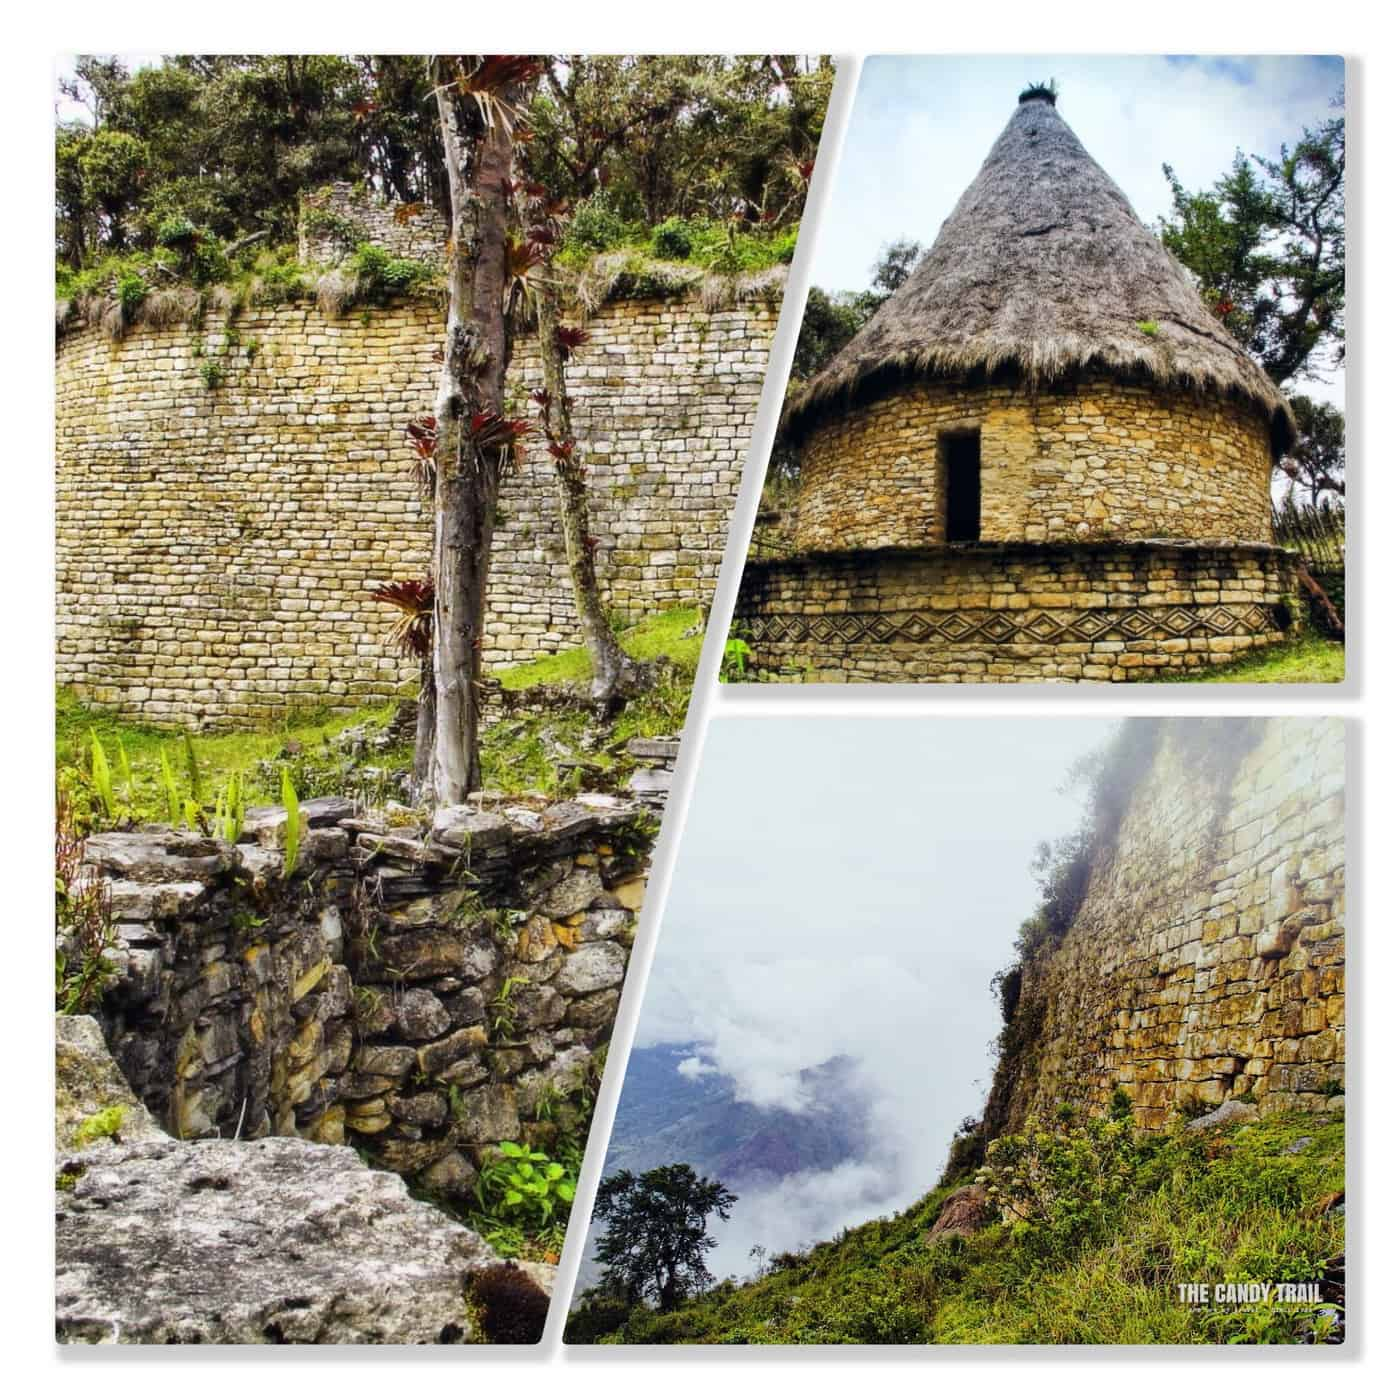 kuelap house wall ruins chachapoyas peru